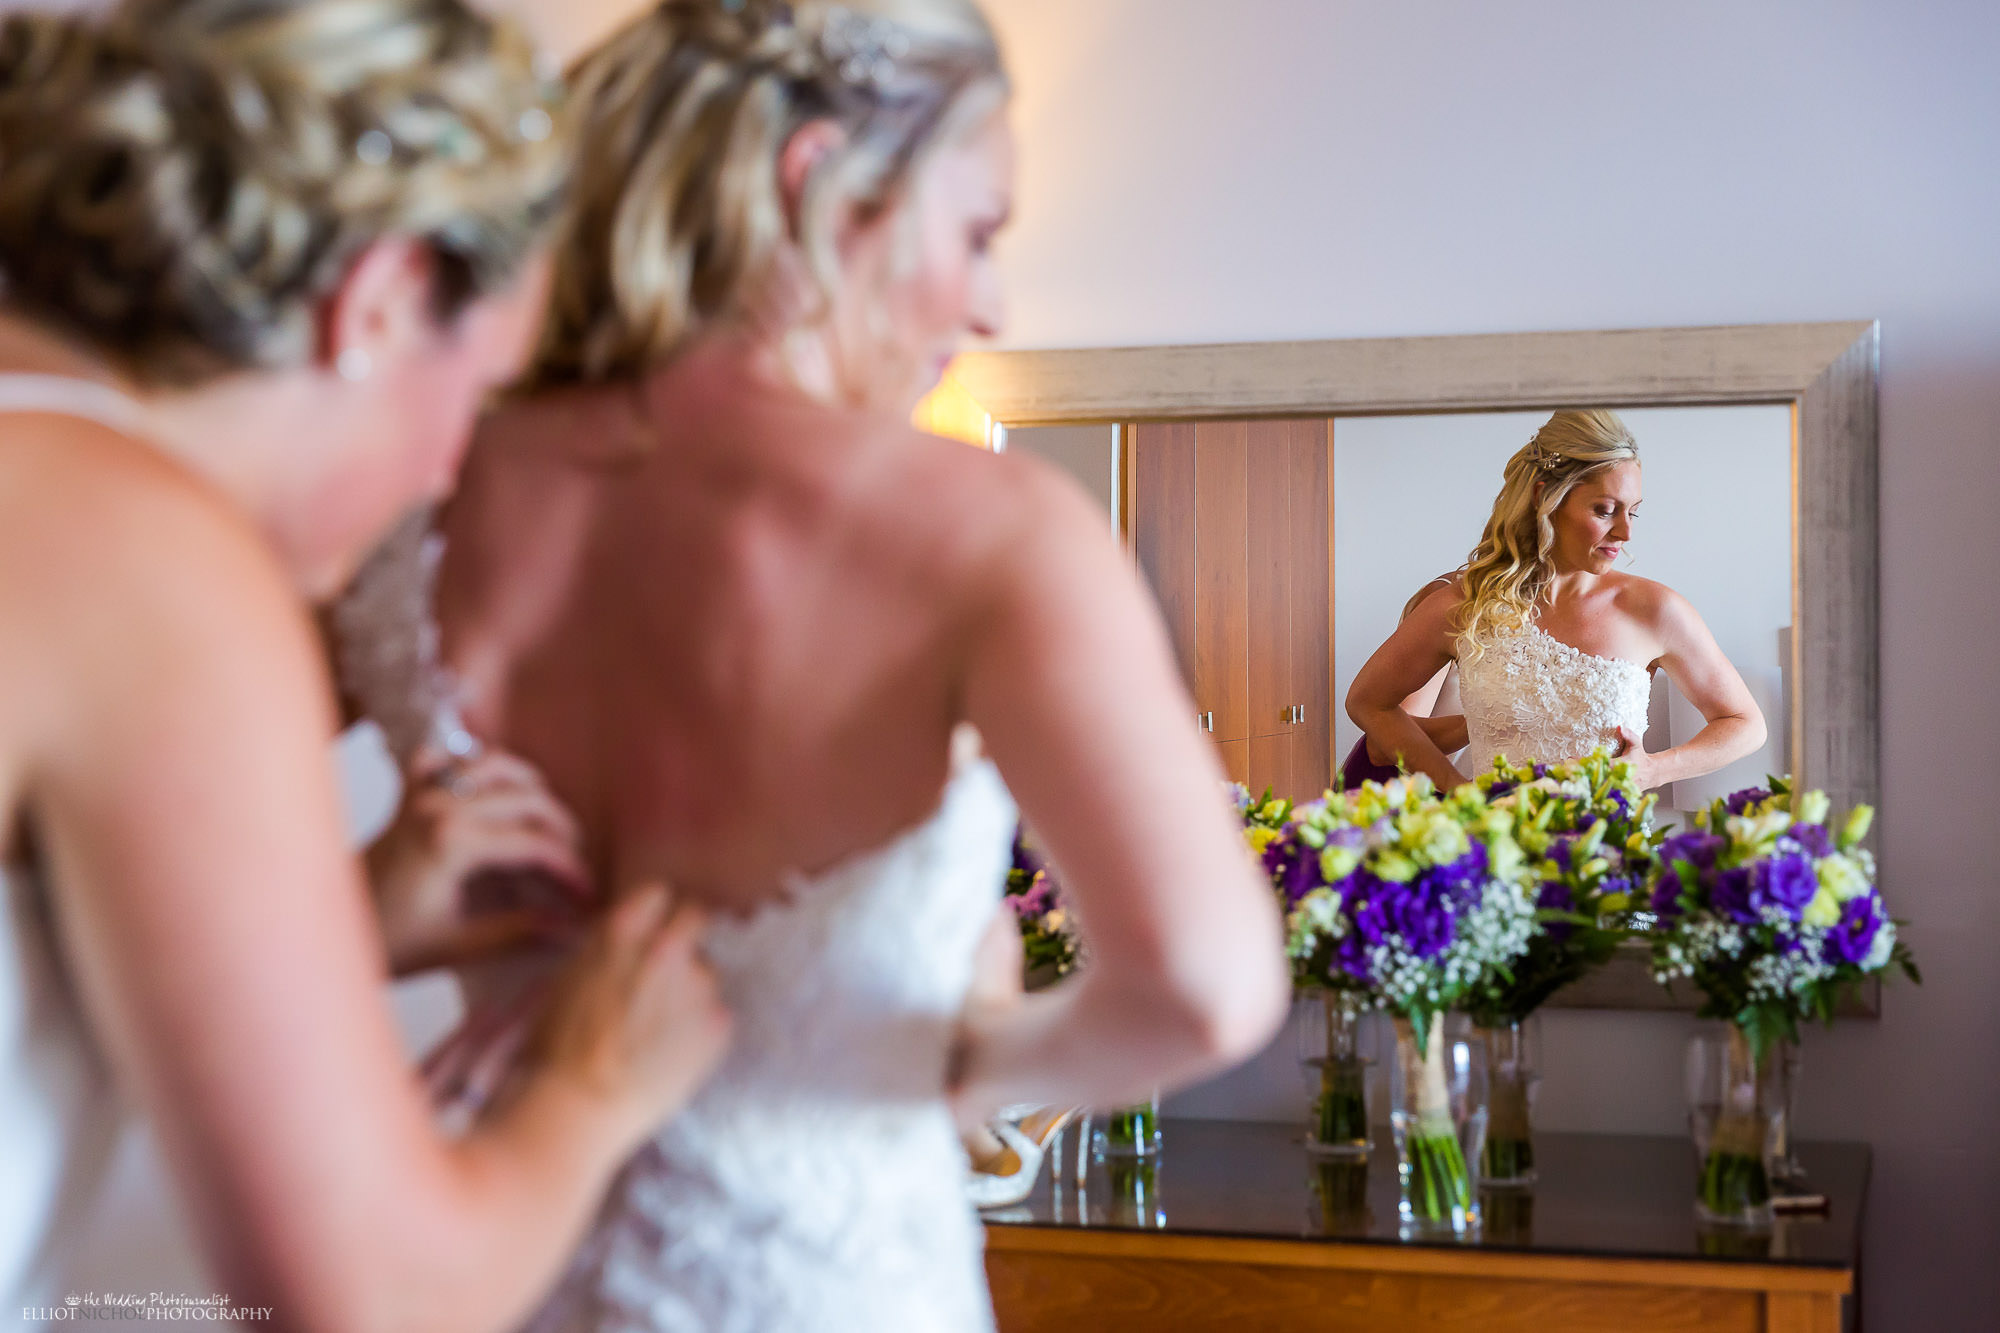 bride-wedding-dress-weddings-photographer-photography-bouquets-destination-wedding